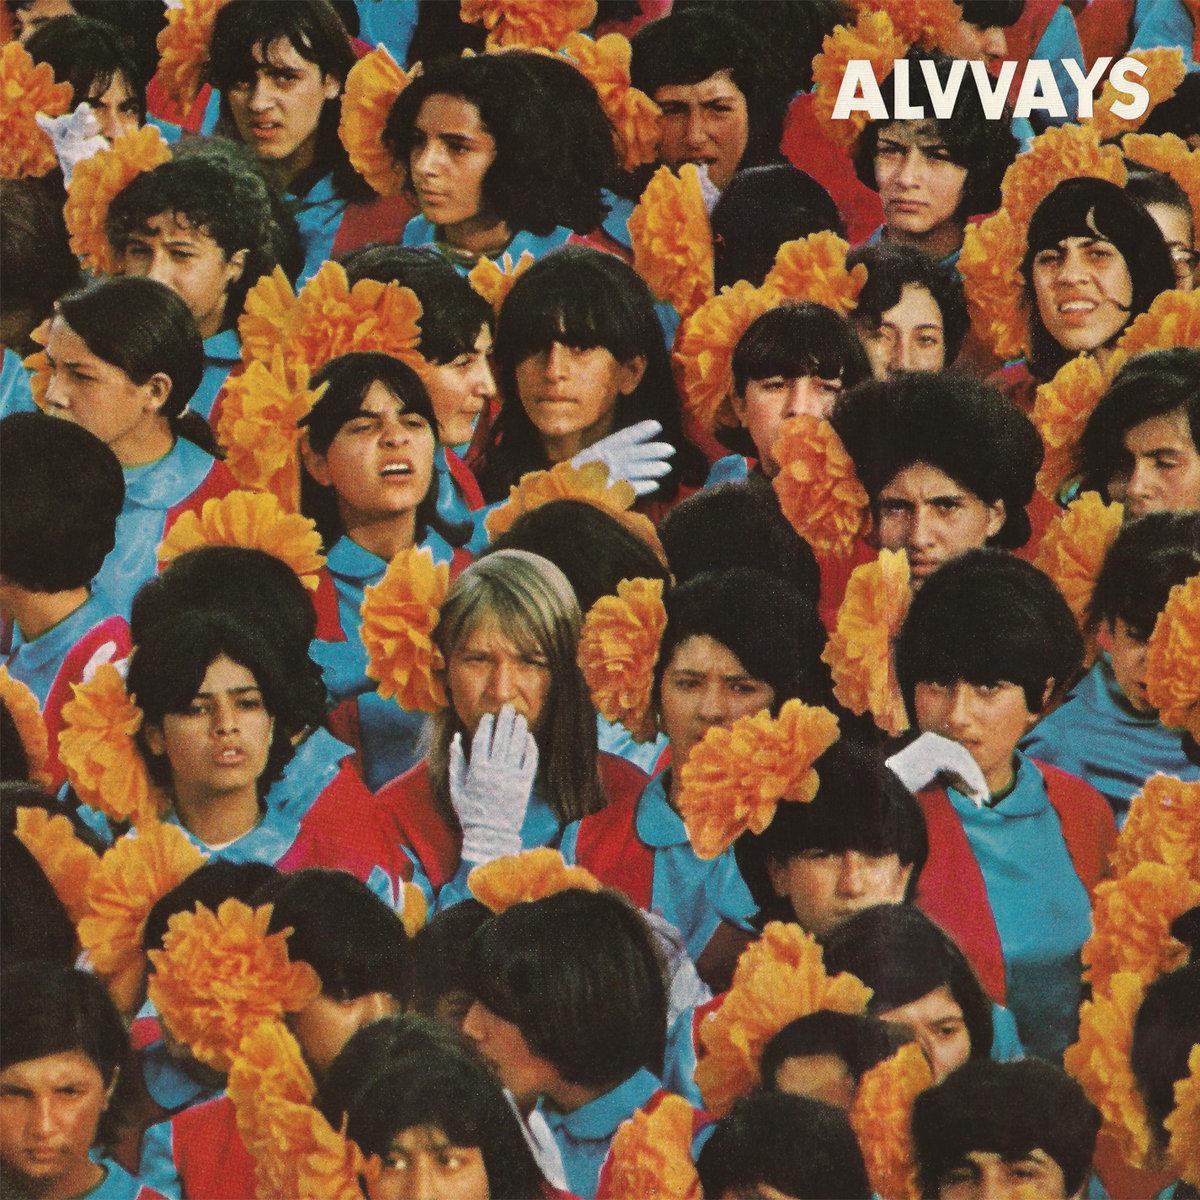 Alvvays / Alvvays (LP)